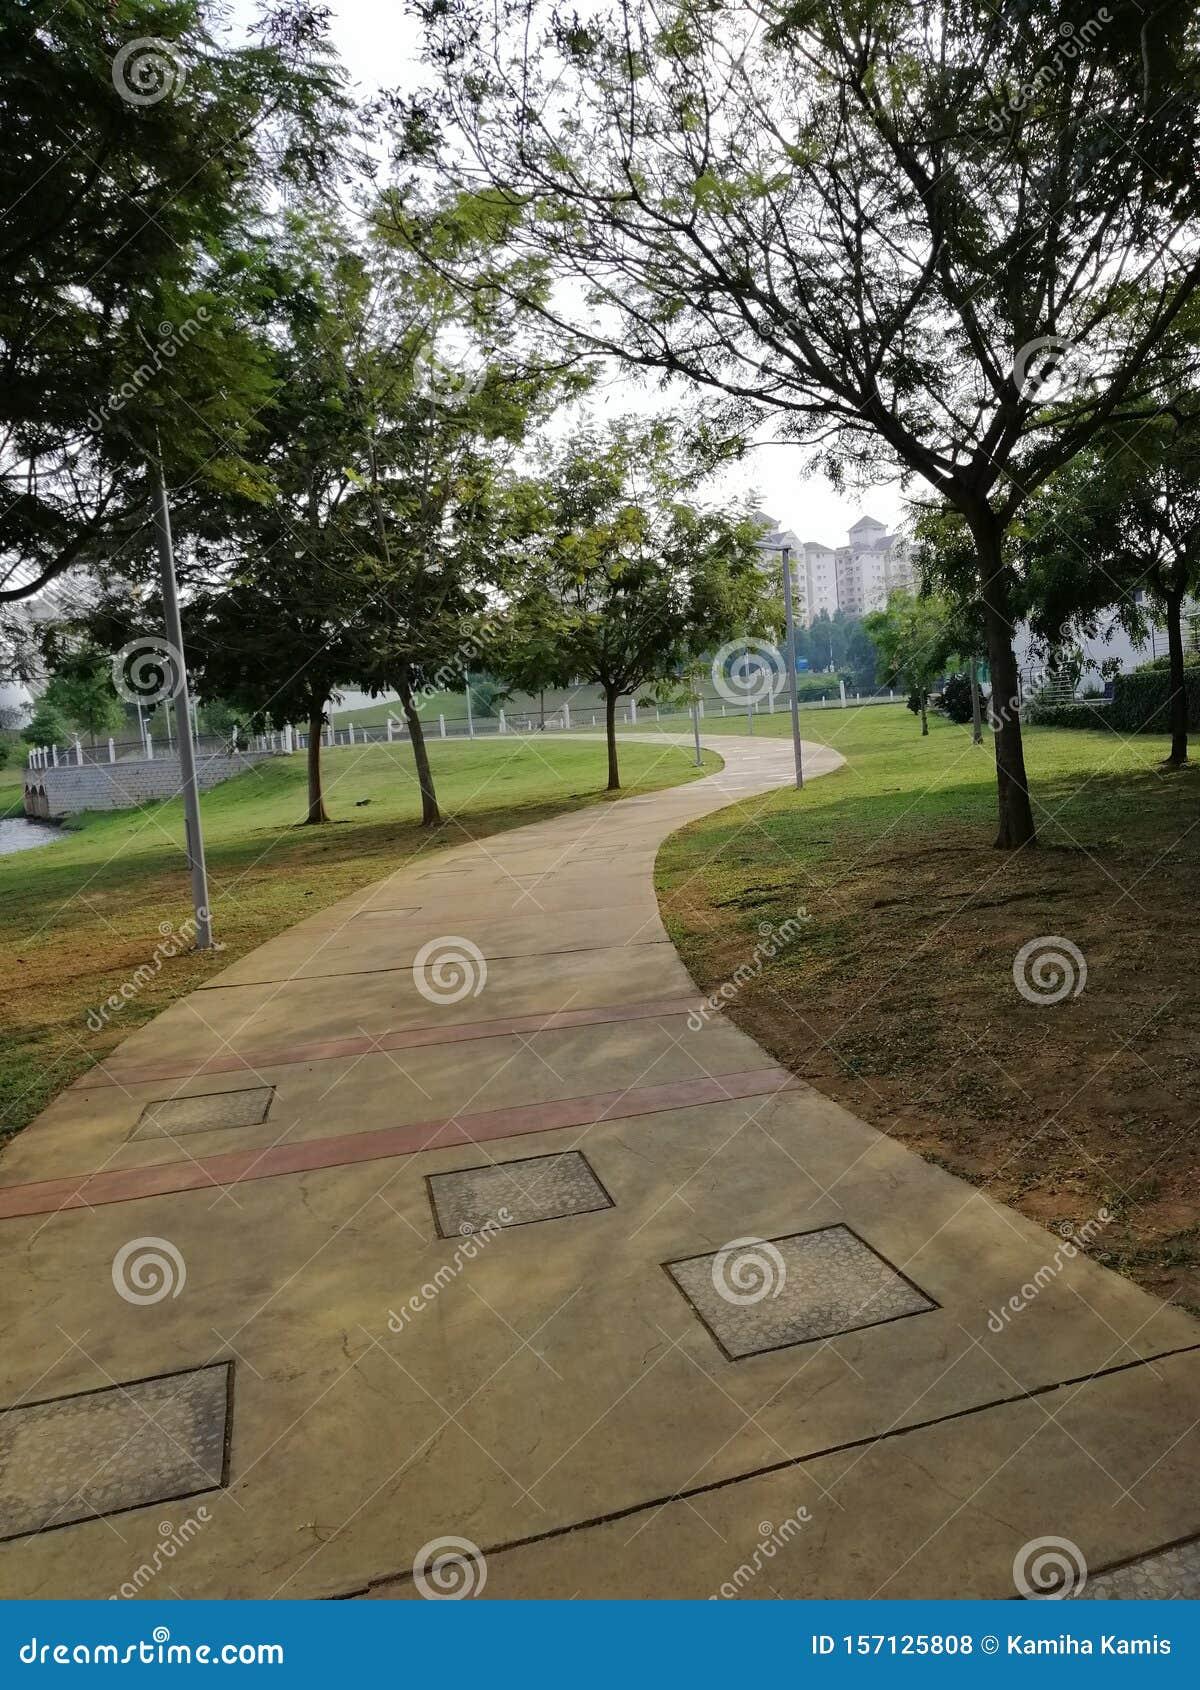 Landscape view of walking pat at Presint 8, Putrajaya